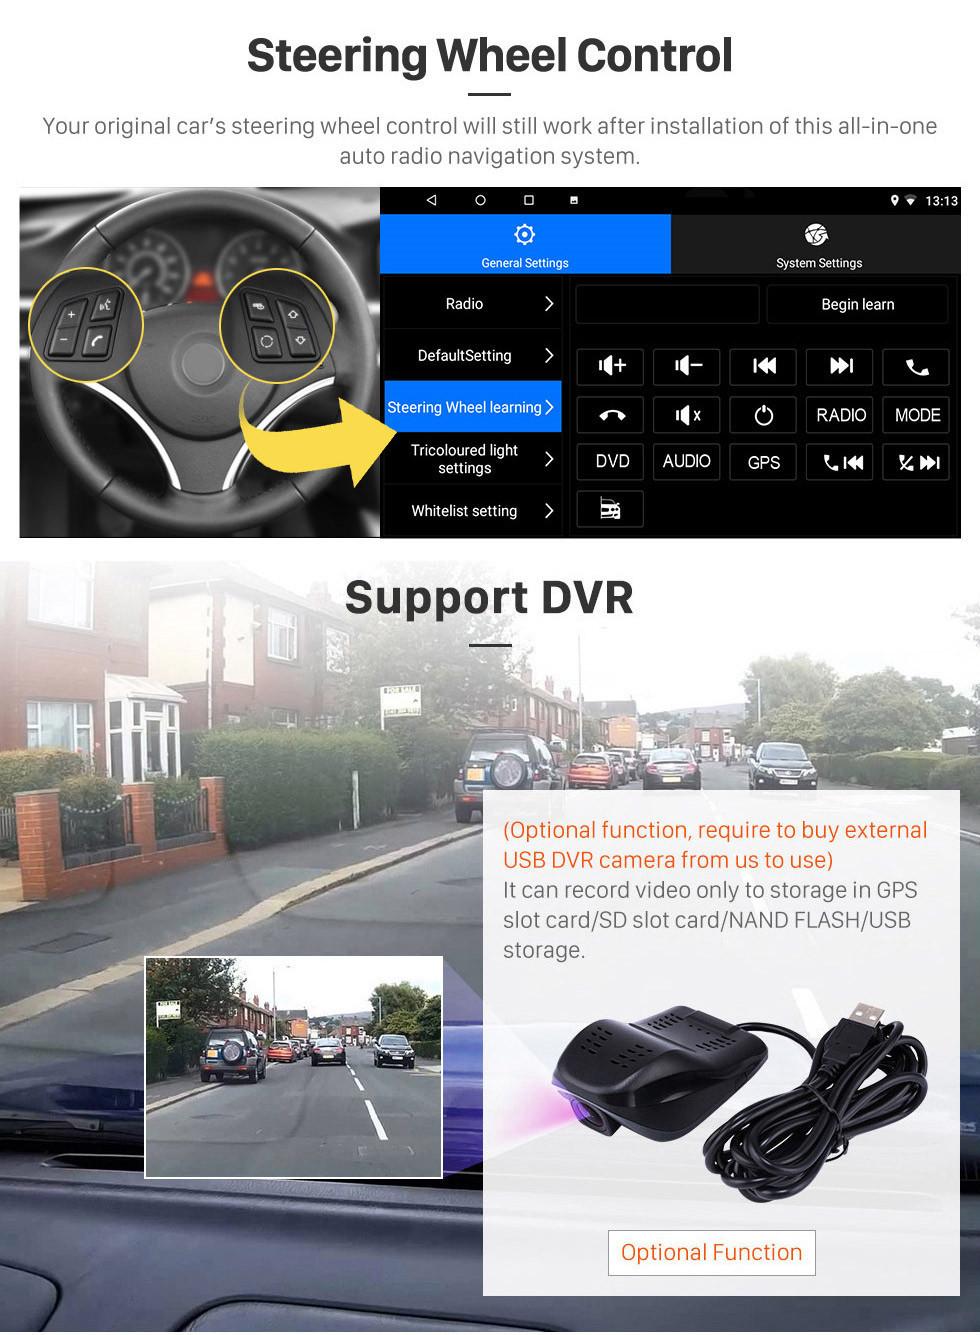 Seicane 10,1-дюймовый Android 10.0 с сенсорным экраном GPS-навигатор для 2017-2019 Kia Cerato Auto A / C с поддержкой Bluetooth USB WIFI AUX Carplay SWC TPMS